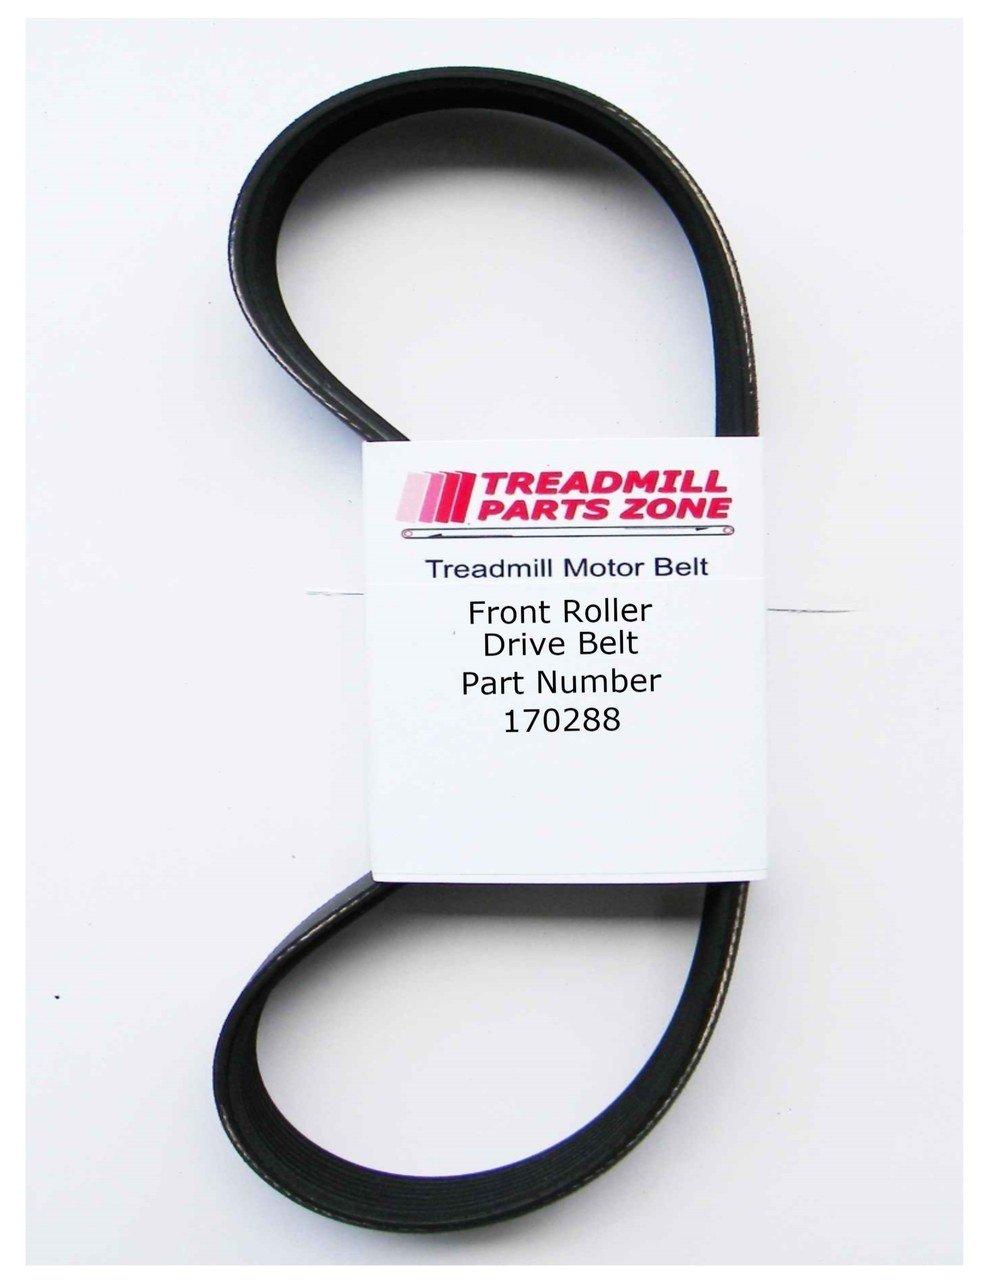 Epic Treadmill Model EPTL156050 800MX Motor Belt Part 170288